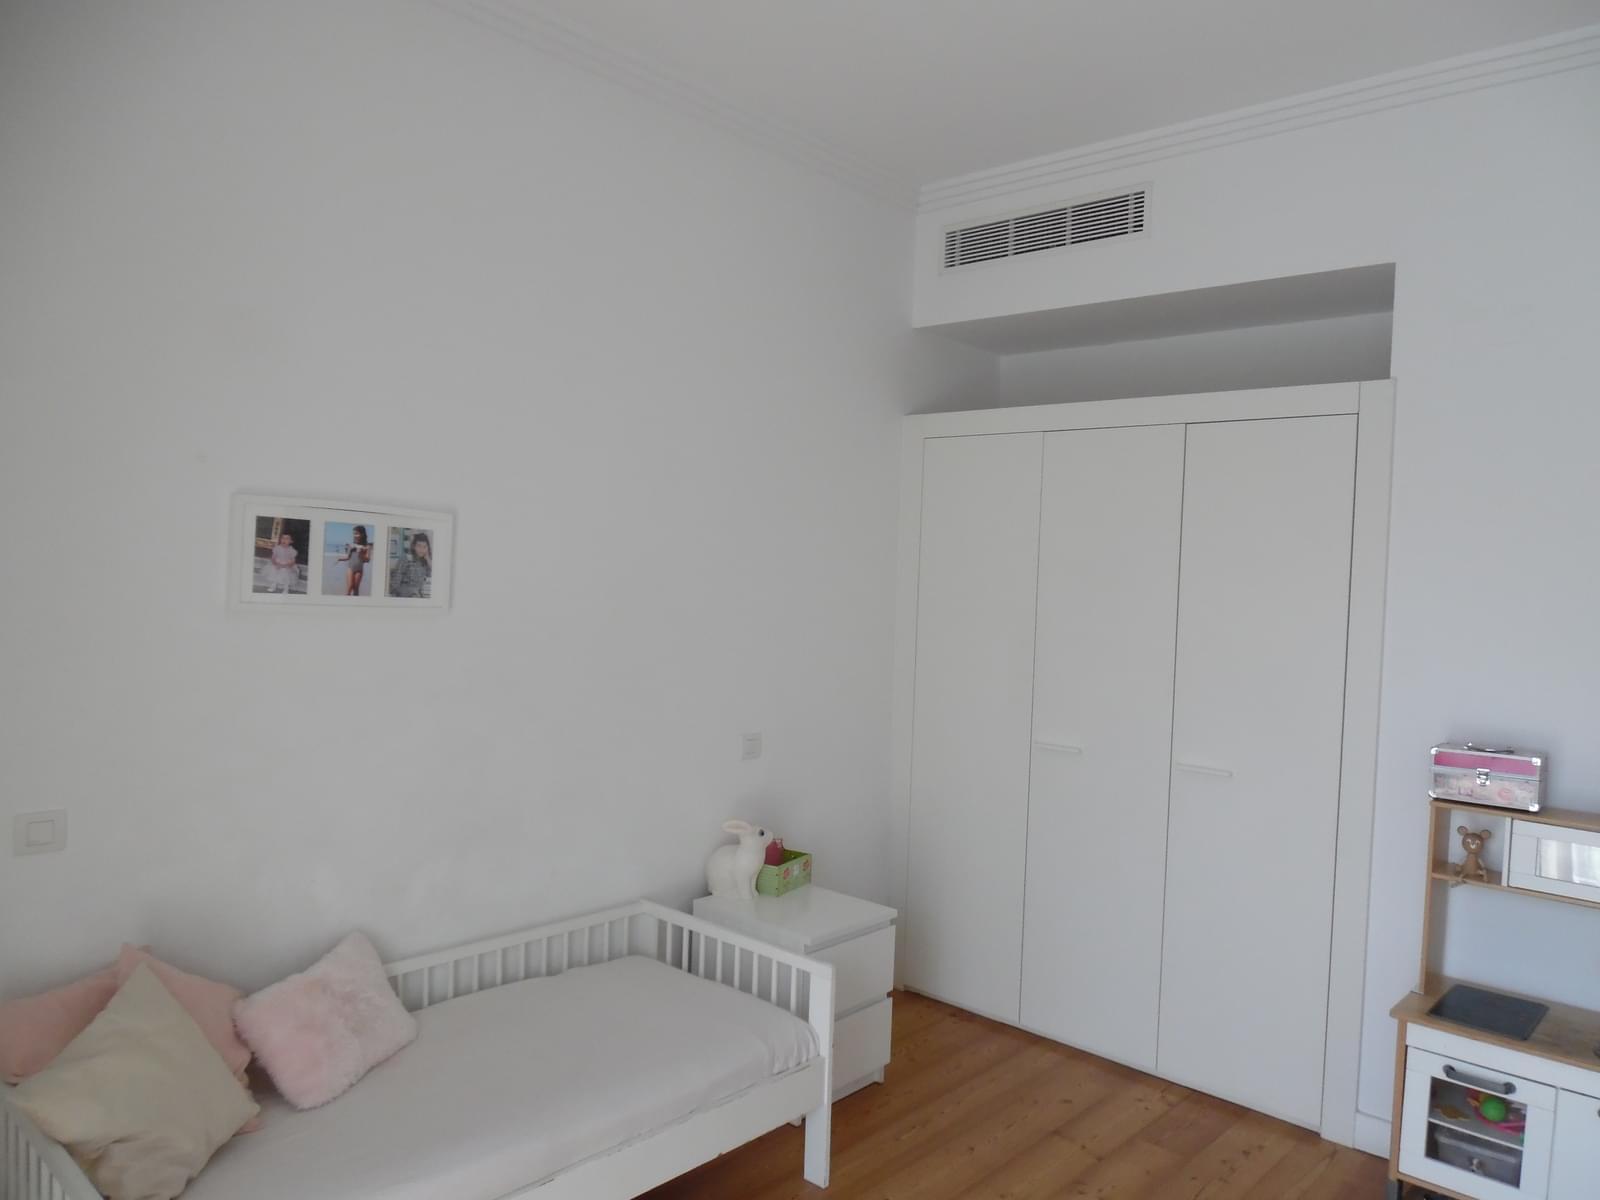 pf17454-apartamento-t4-lisboa-01047757-f1f1-4030-8637-5c3c1c2c11ee